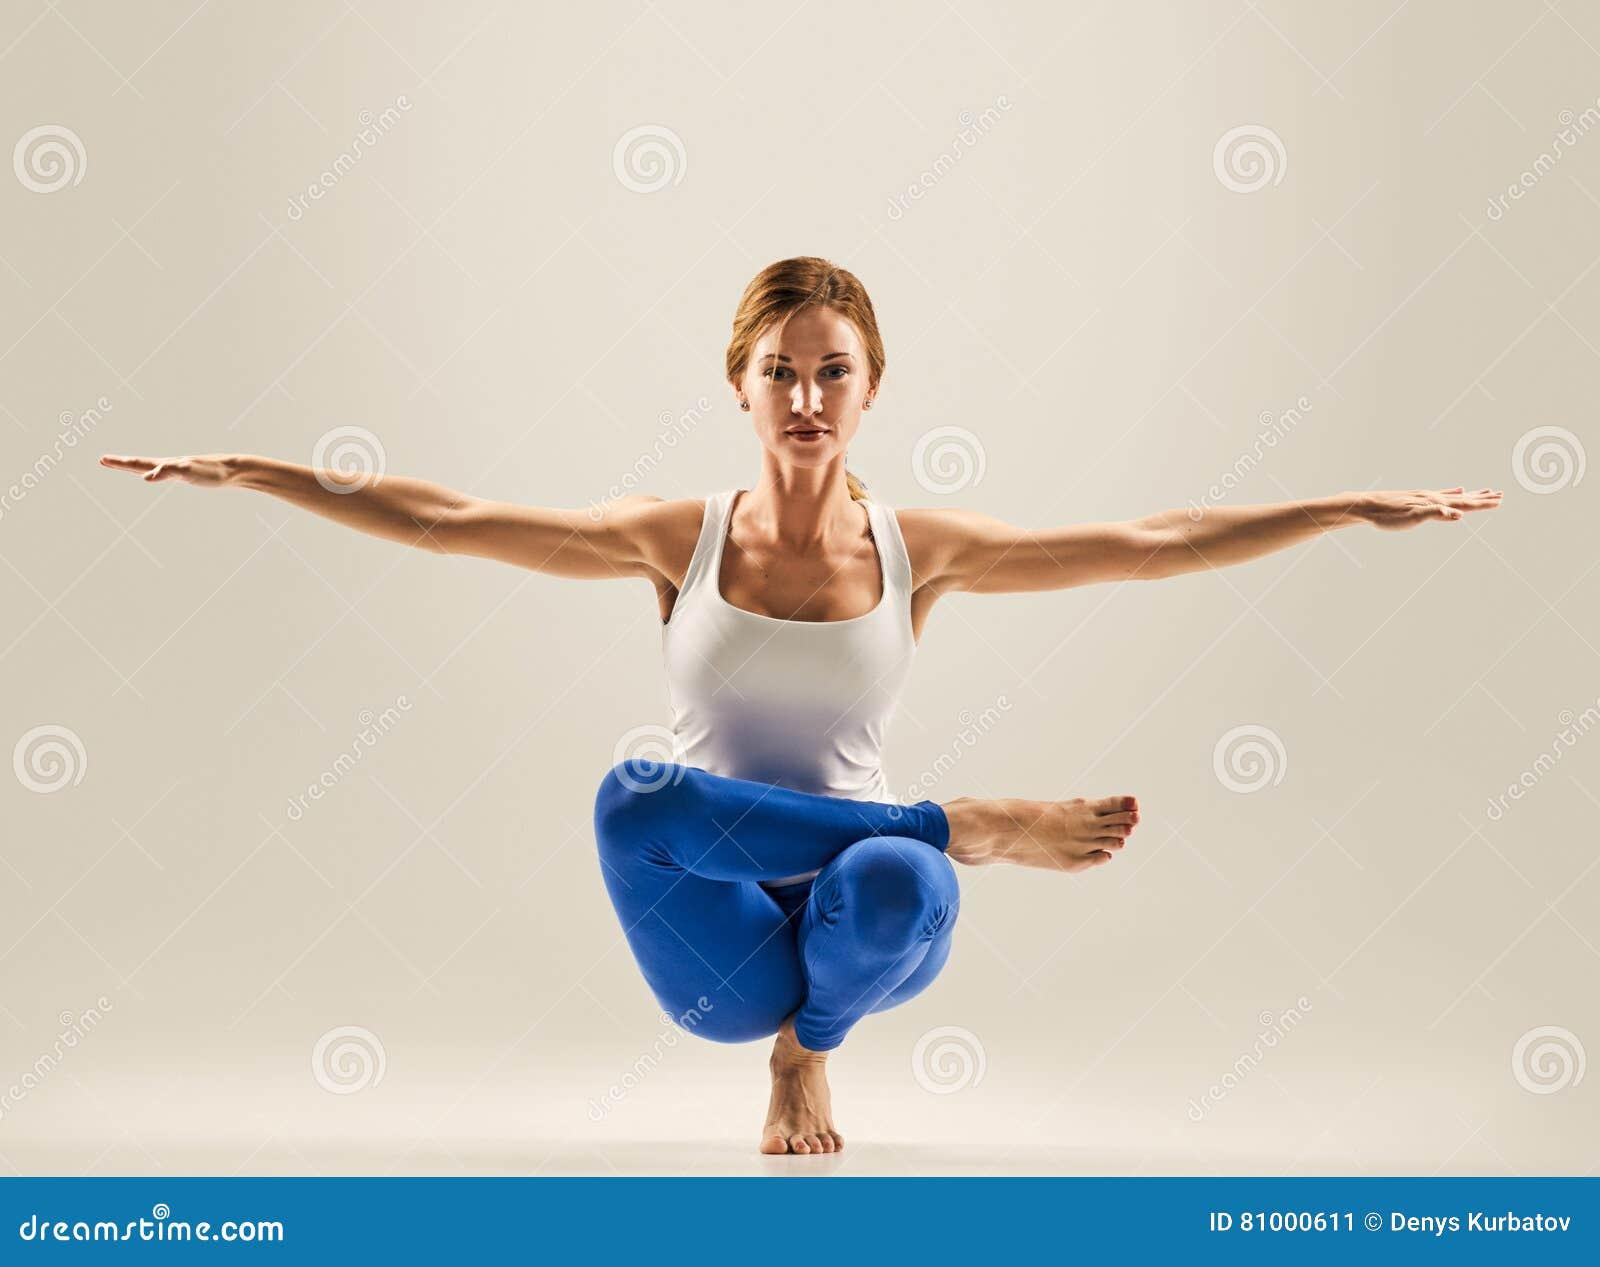 young beautiful yoga pose balancing on one leg stock